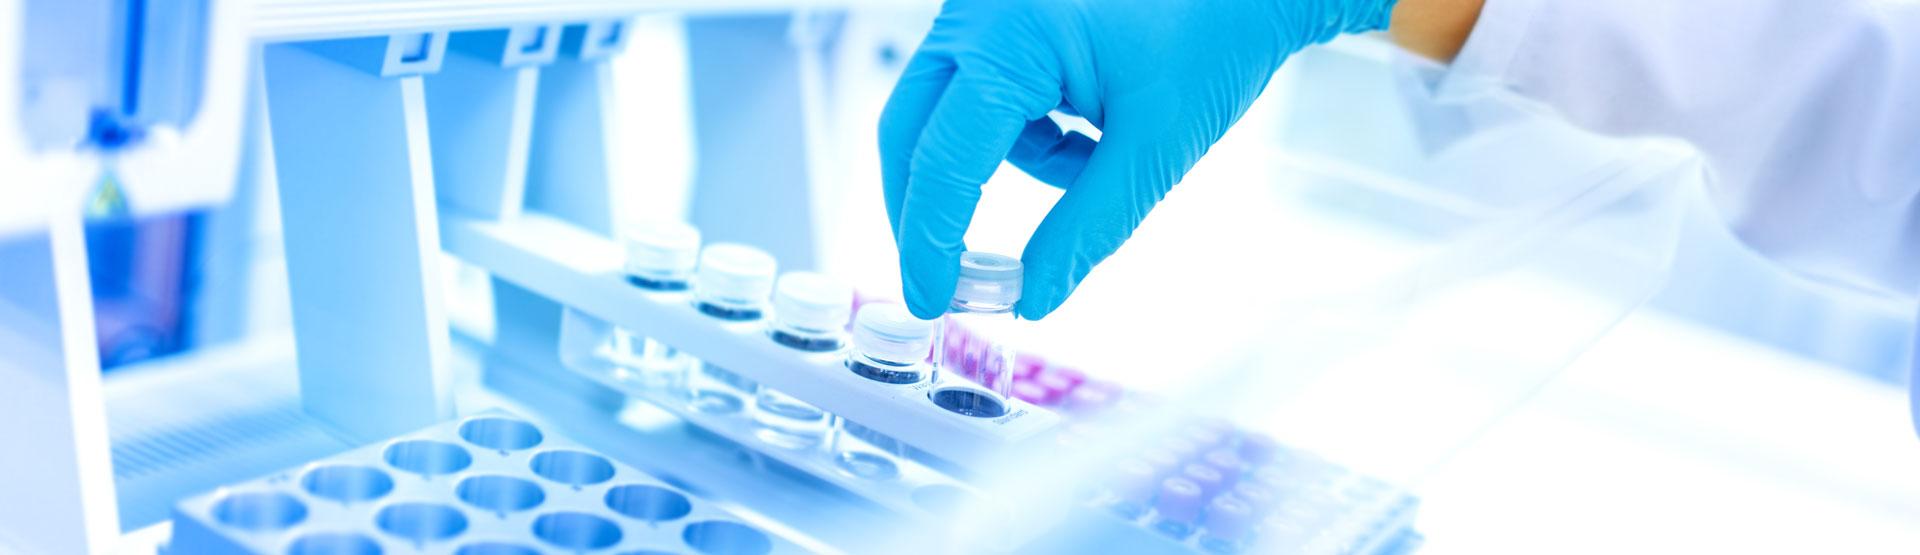 Distribution: TECO Medical Instruments